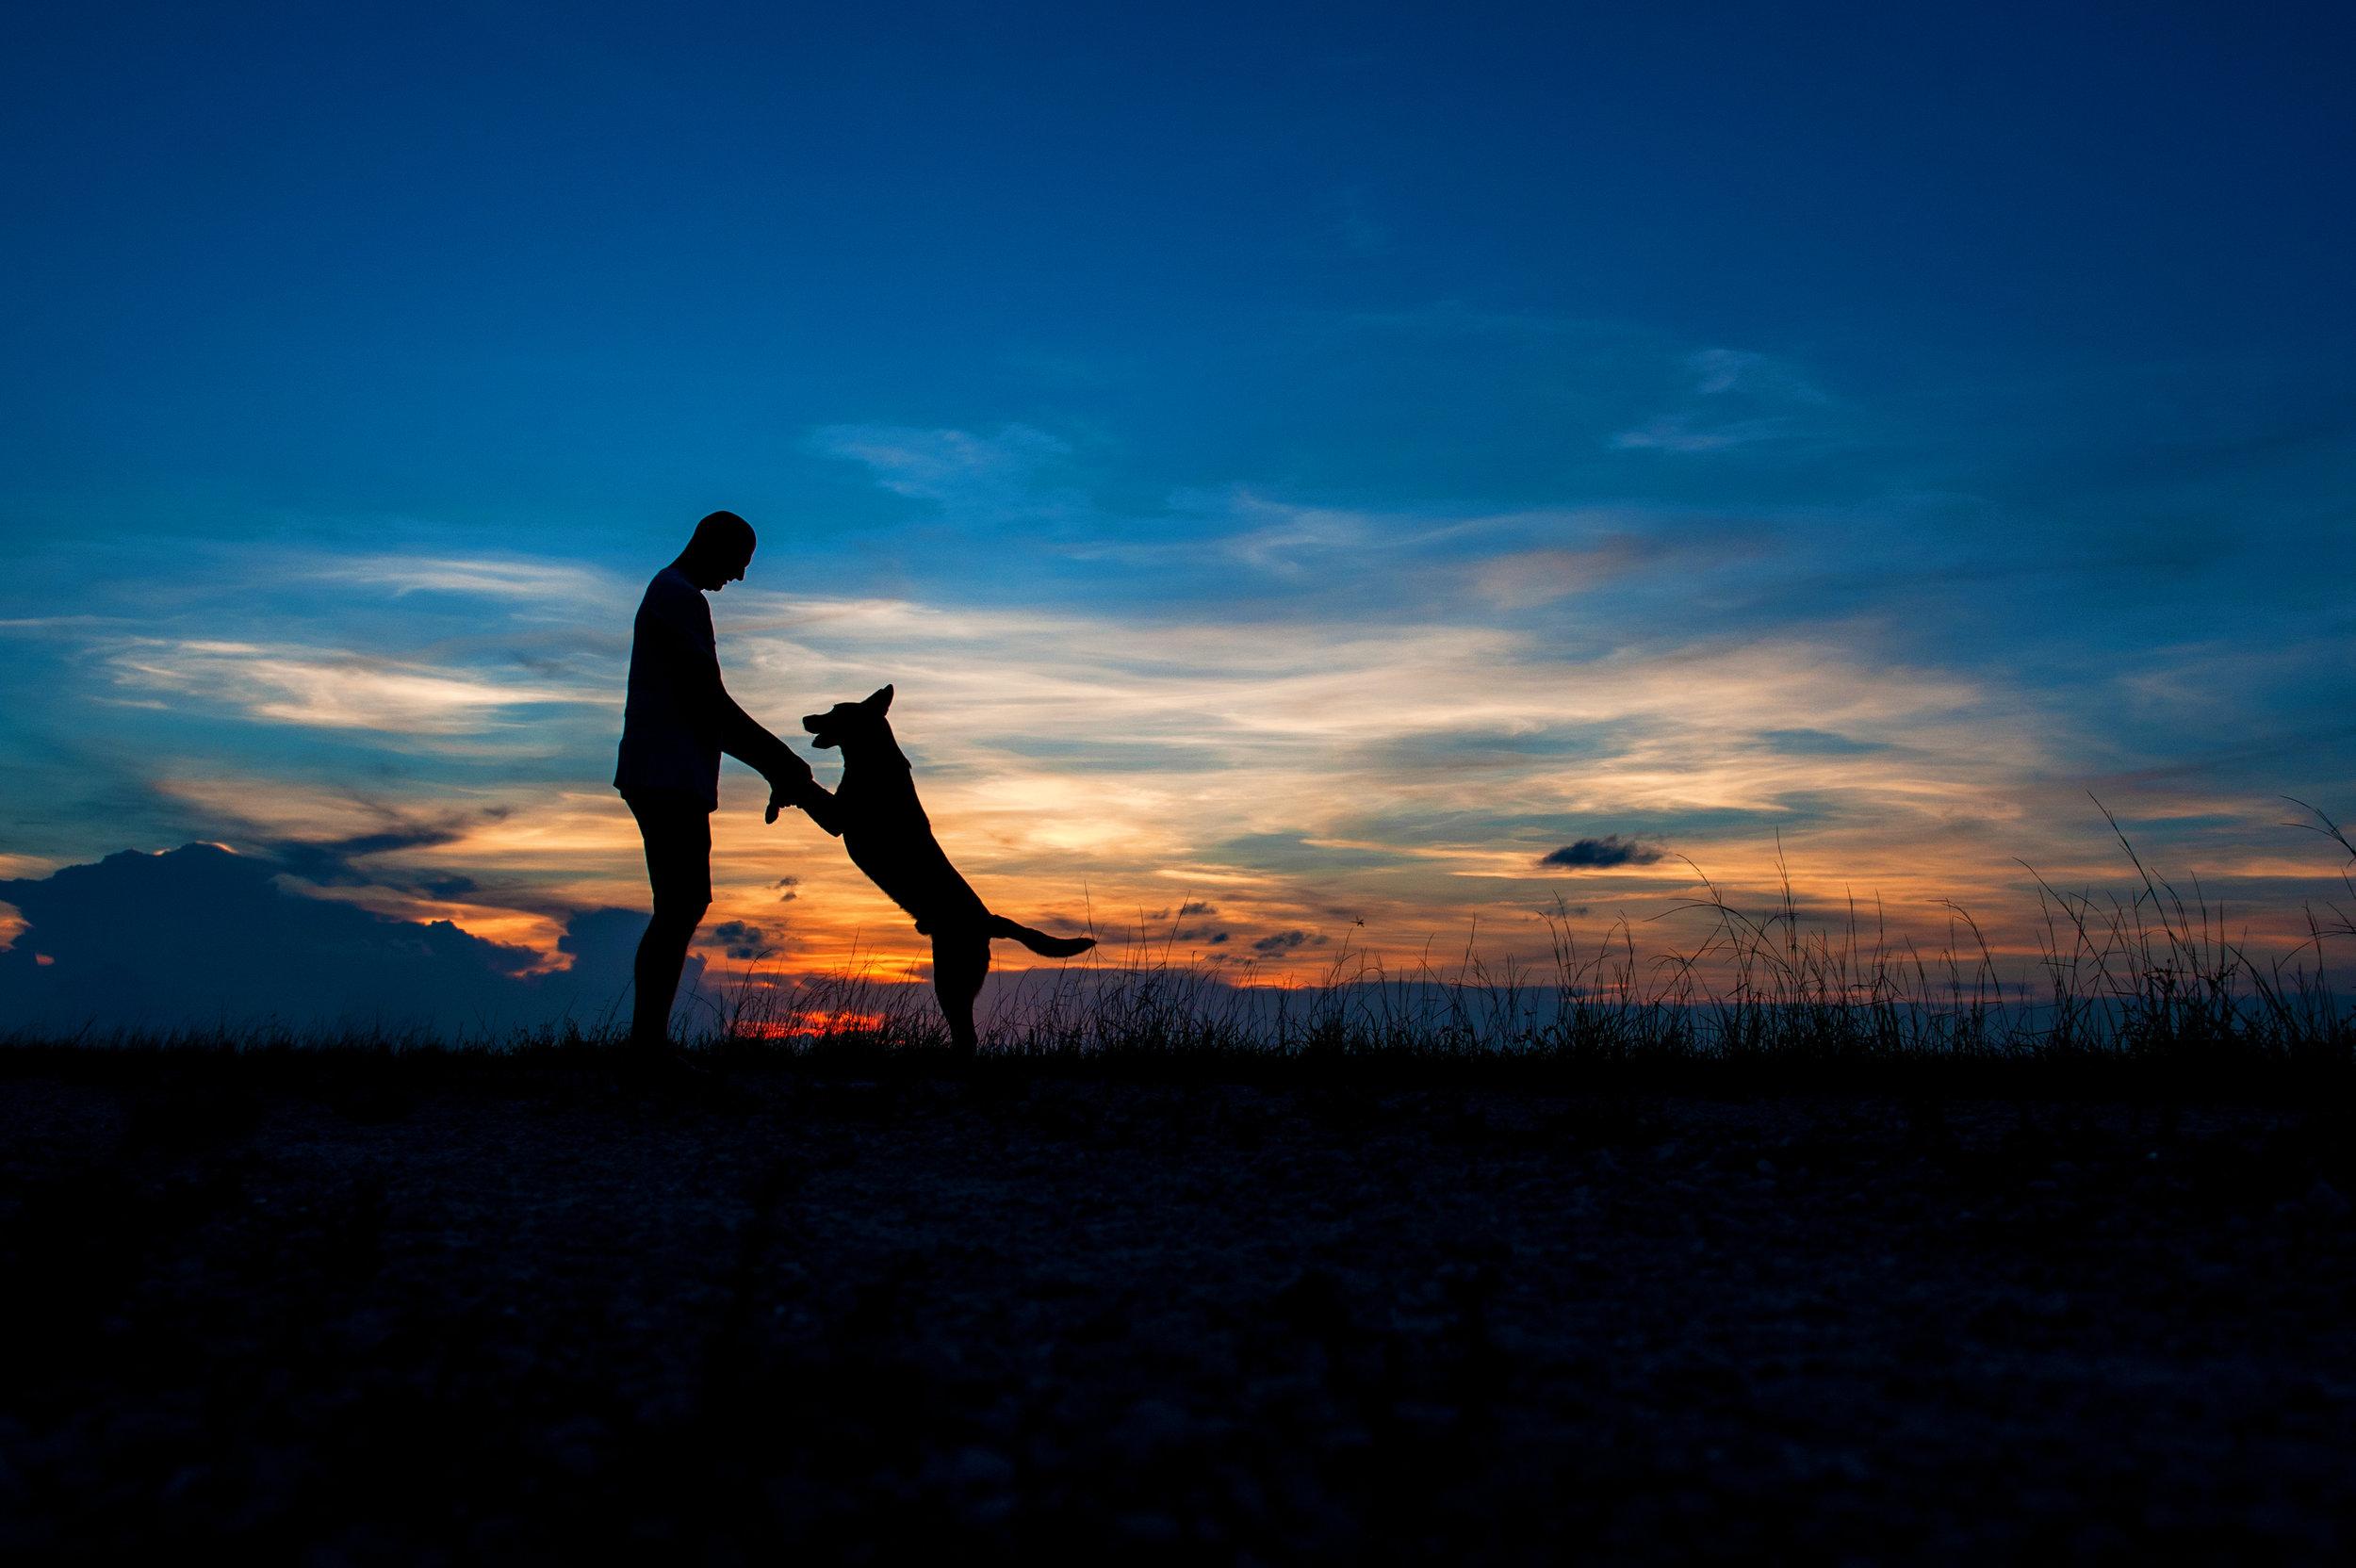 Paola-Paladini-Sunset-Silhouettes-Dog-Love